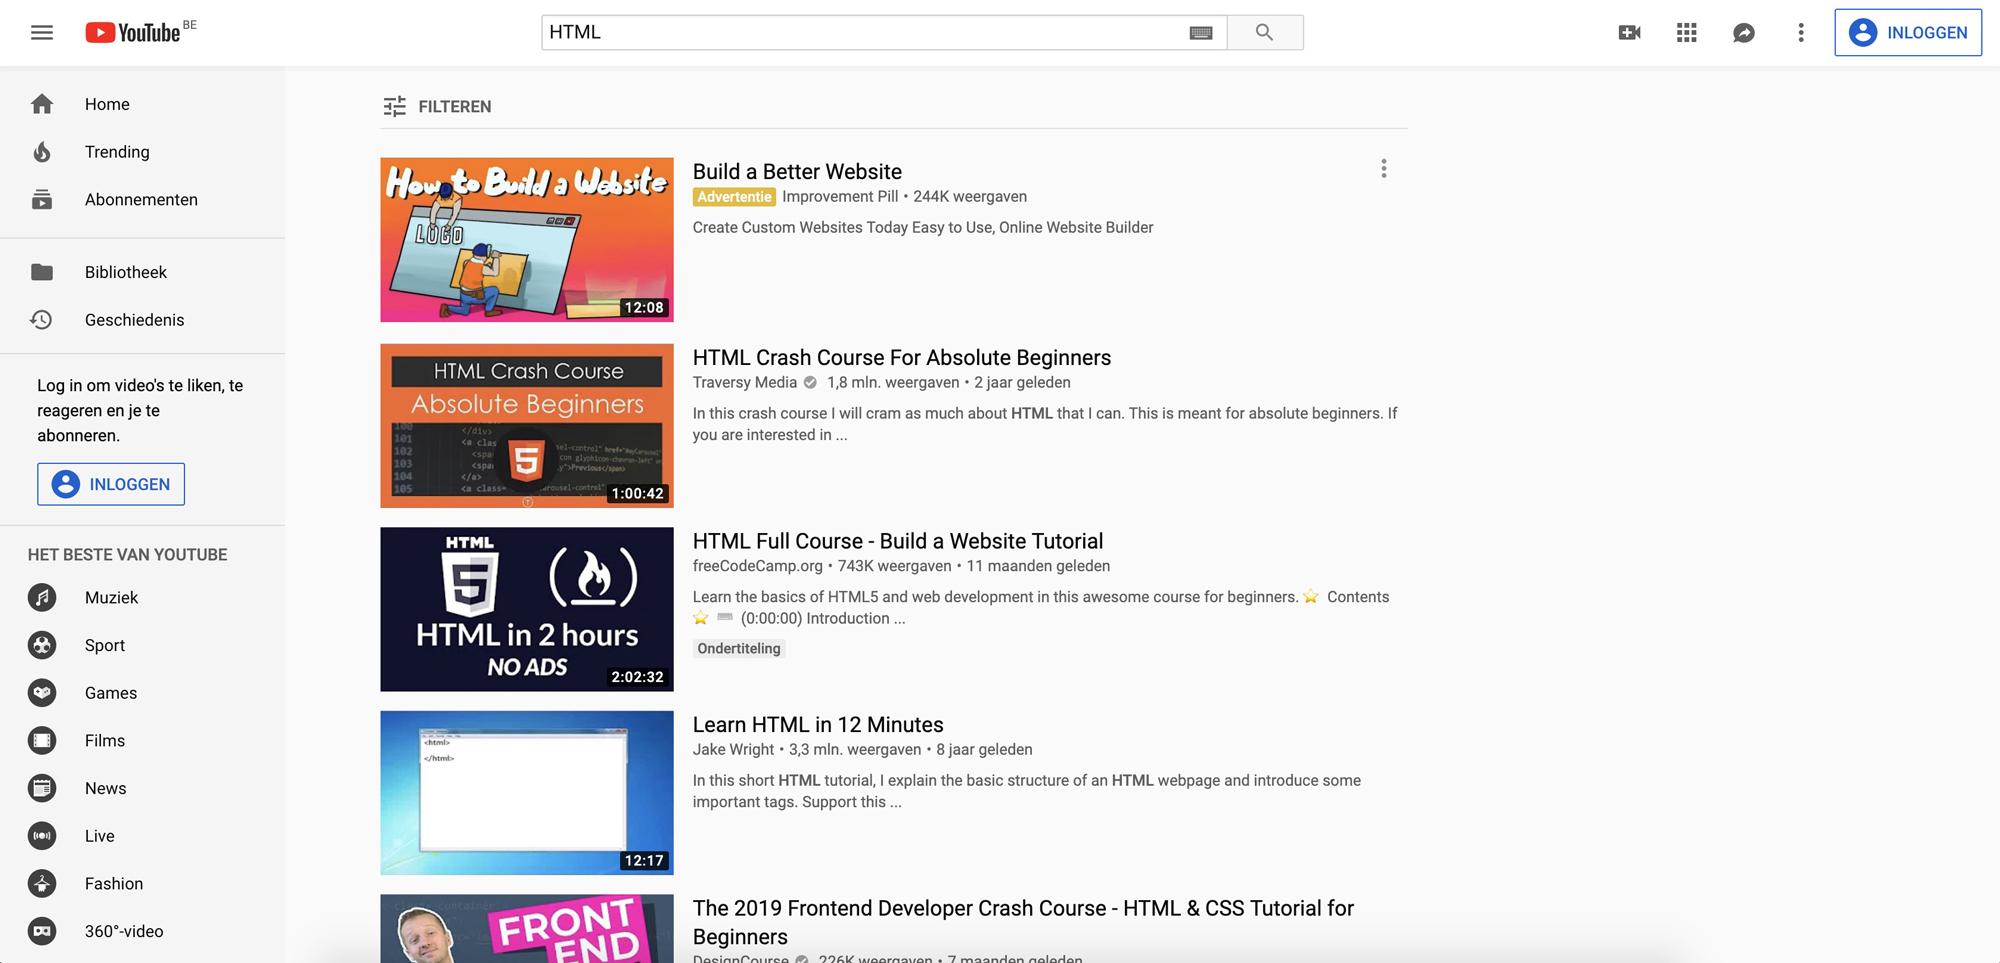 Youtube dashboard